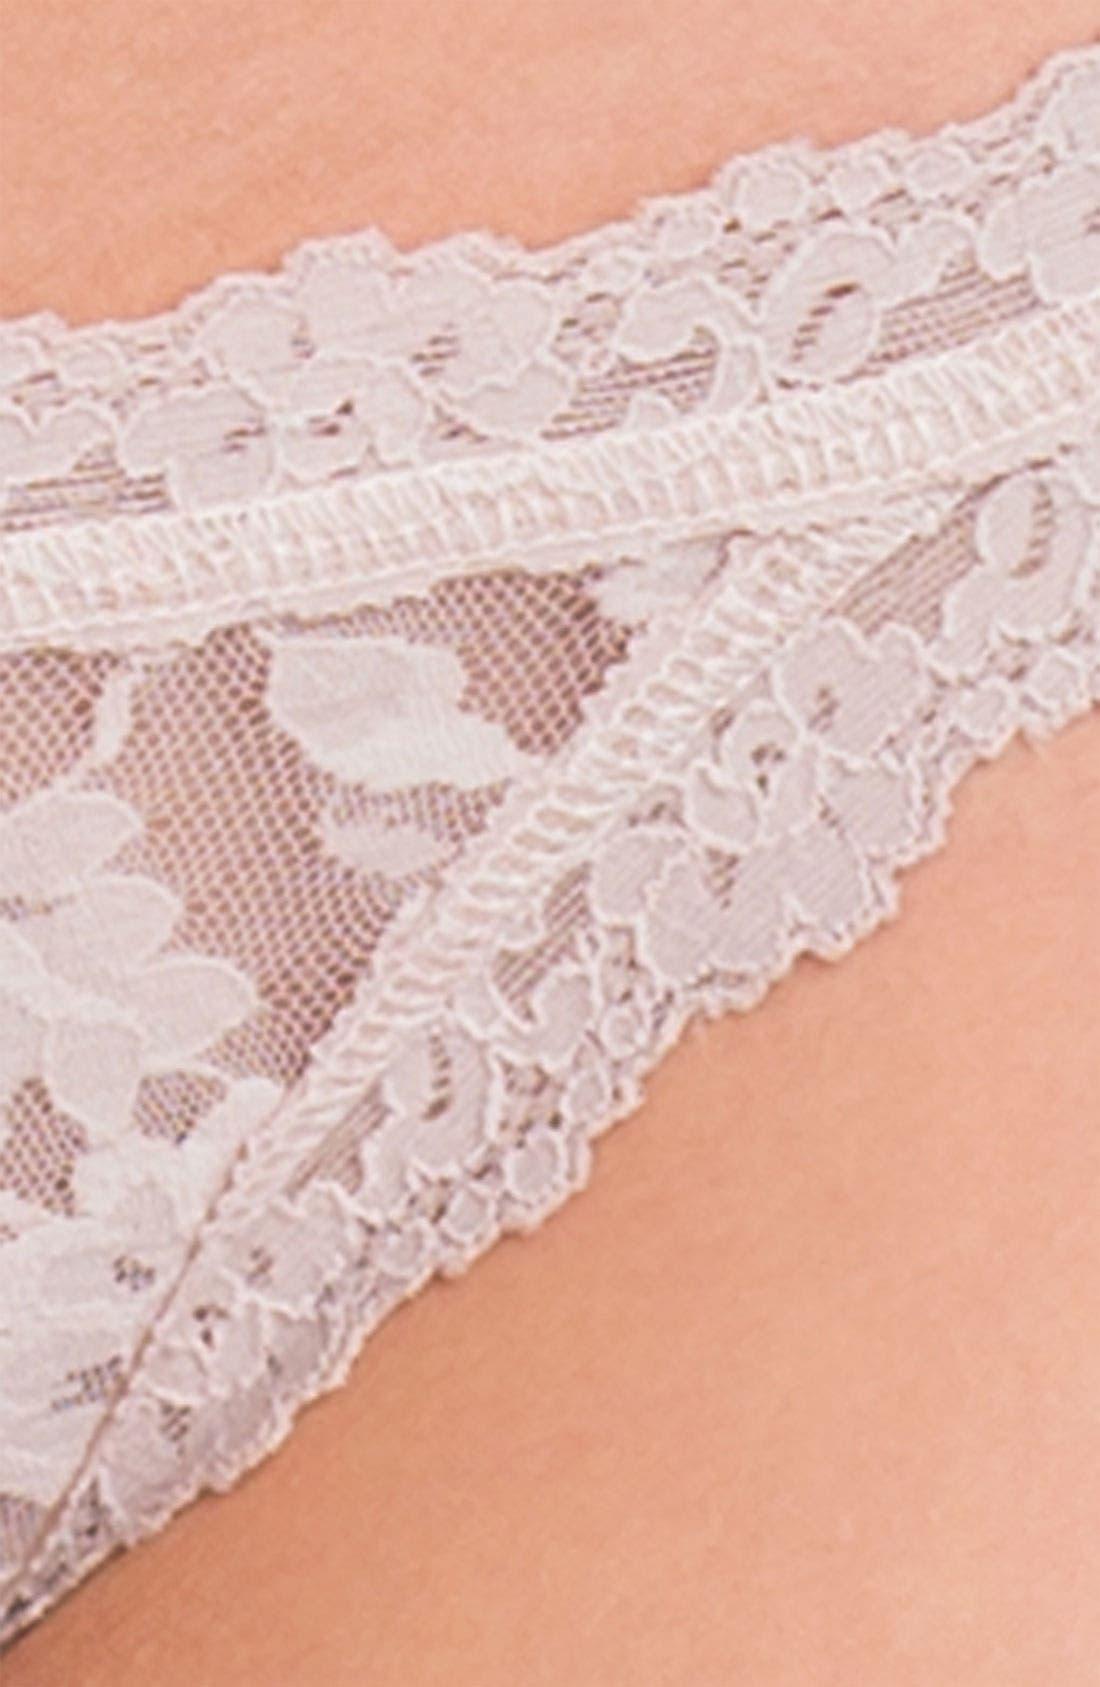 'Signature Lace' Brazilian Bikini,                             Alternate thumbnail 70, color,